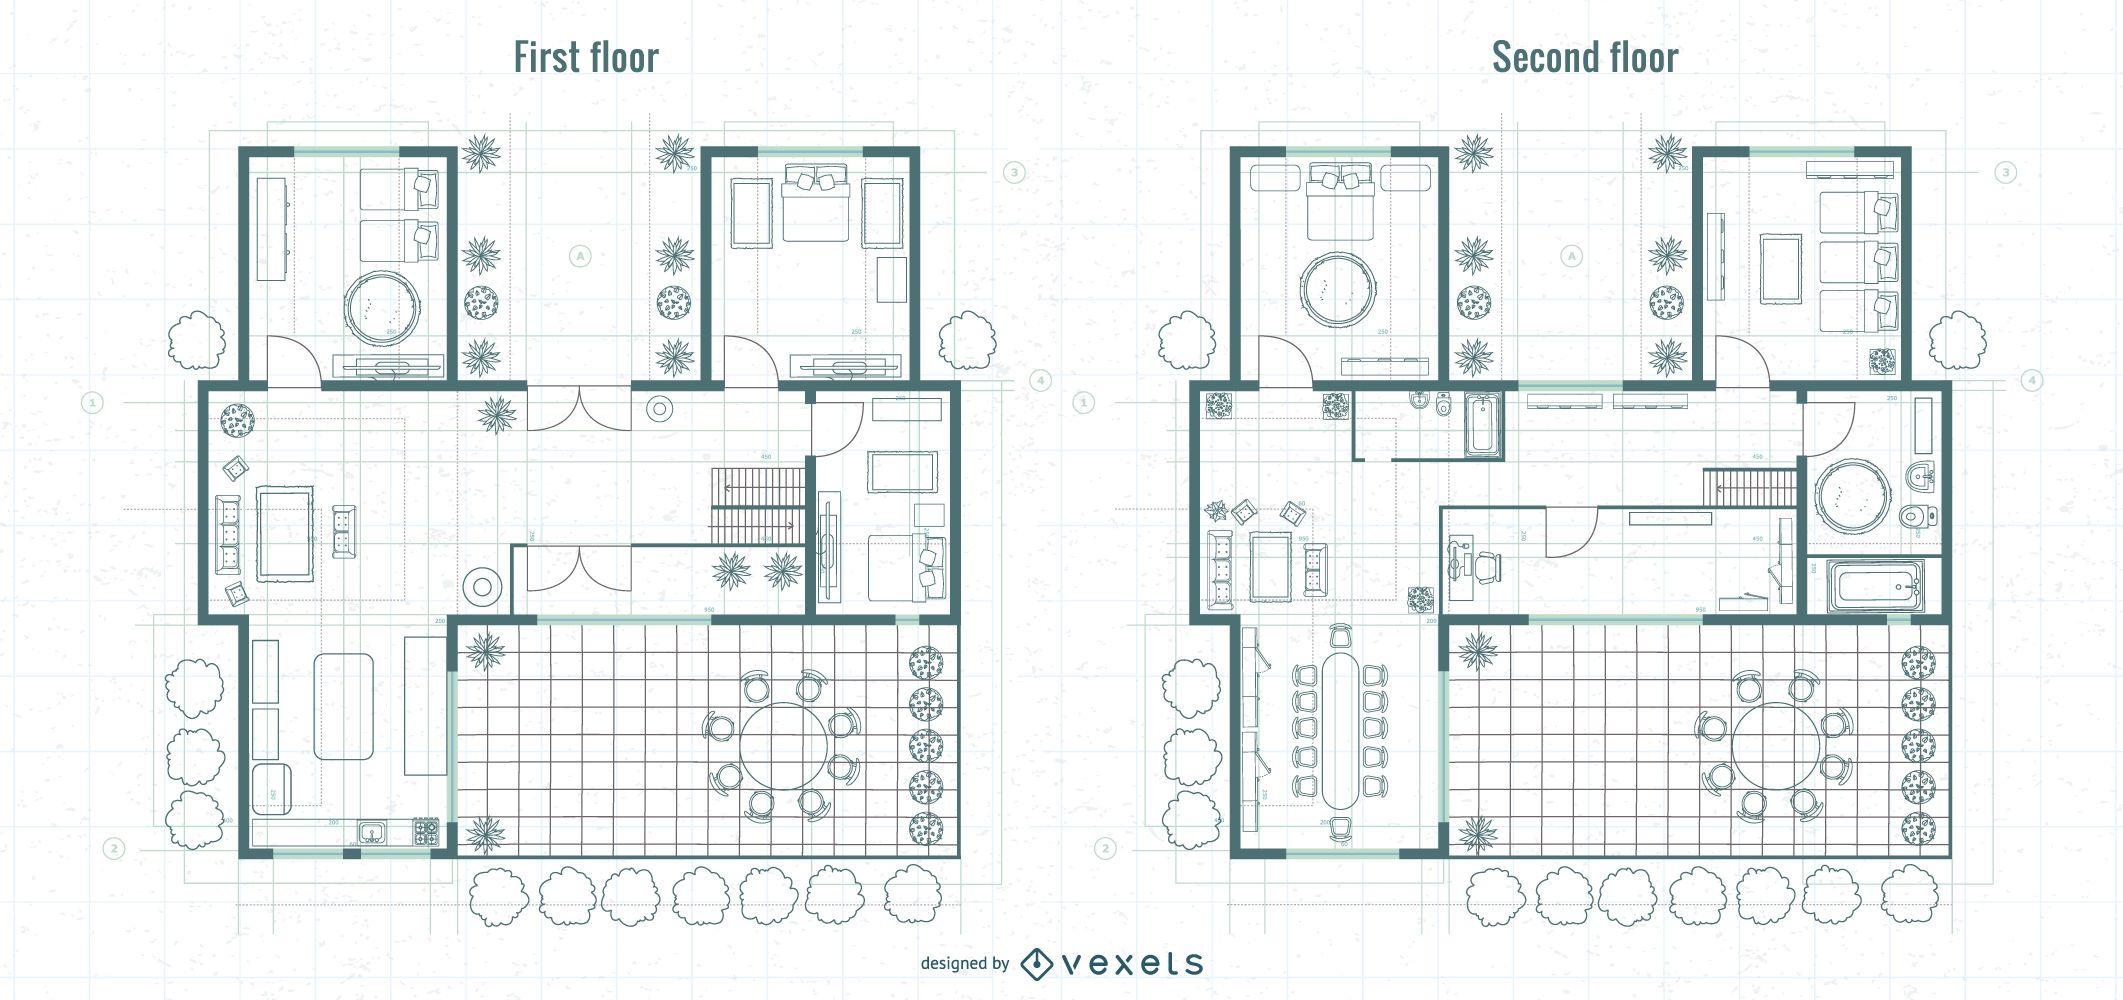 Architecture First and Upper Floor Blueprint Design